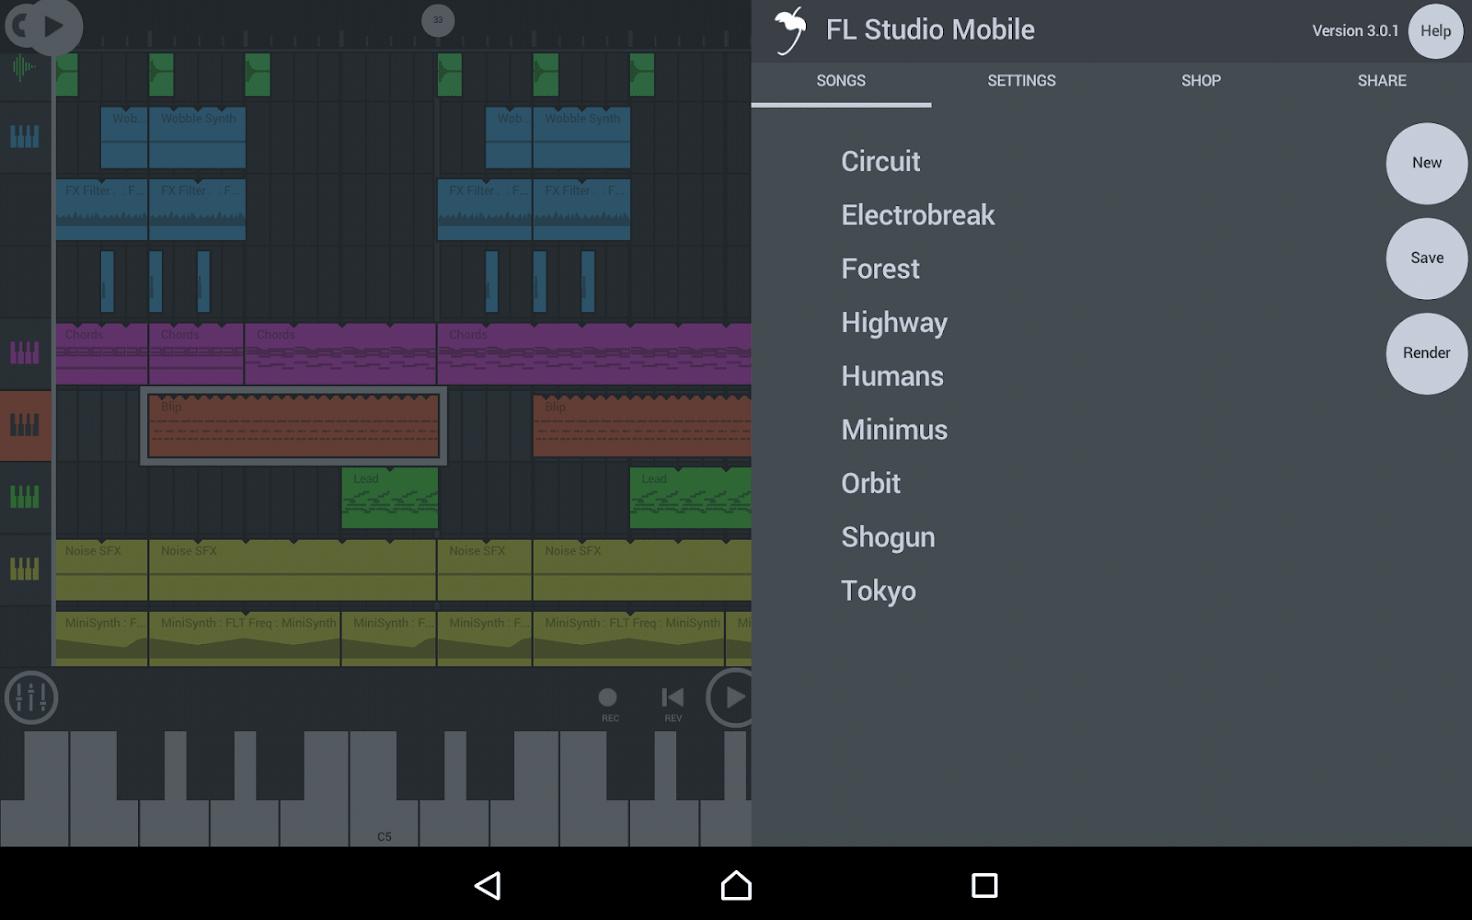 FL Studio Mobile 1